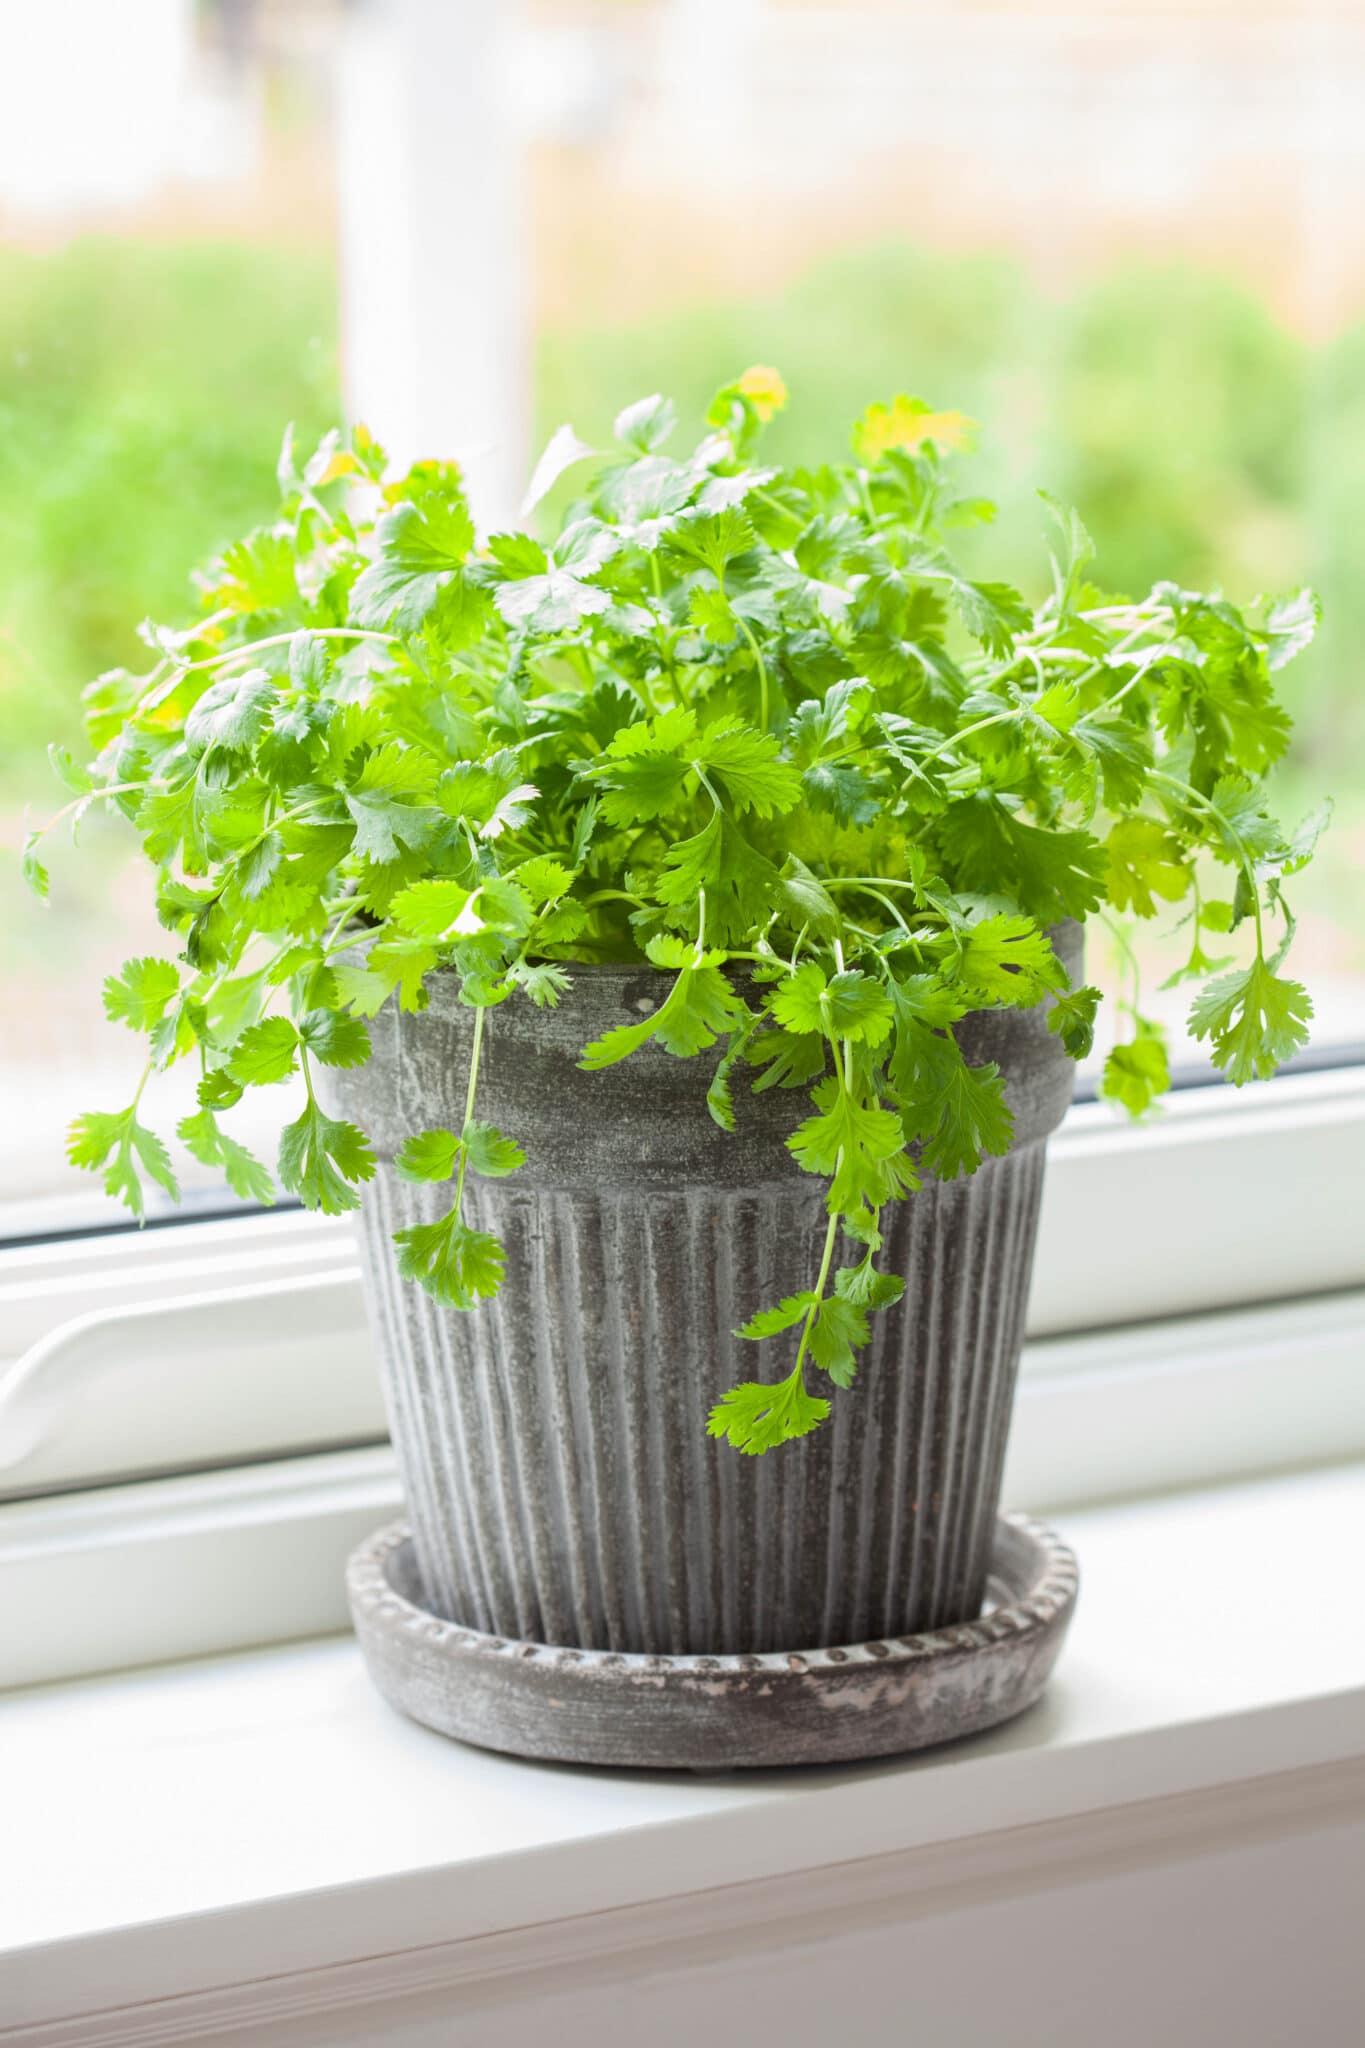 Cilantro growing on a windowsill.